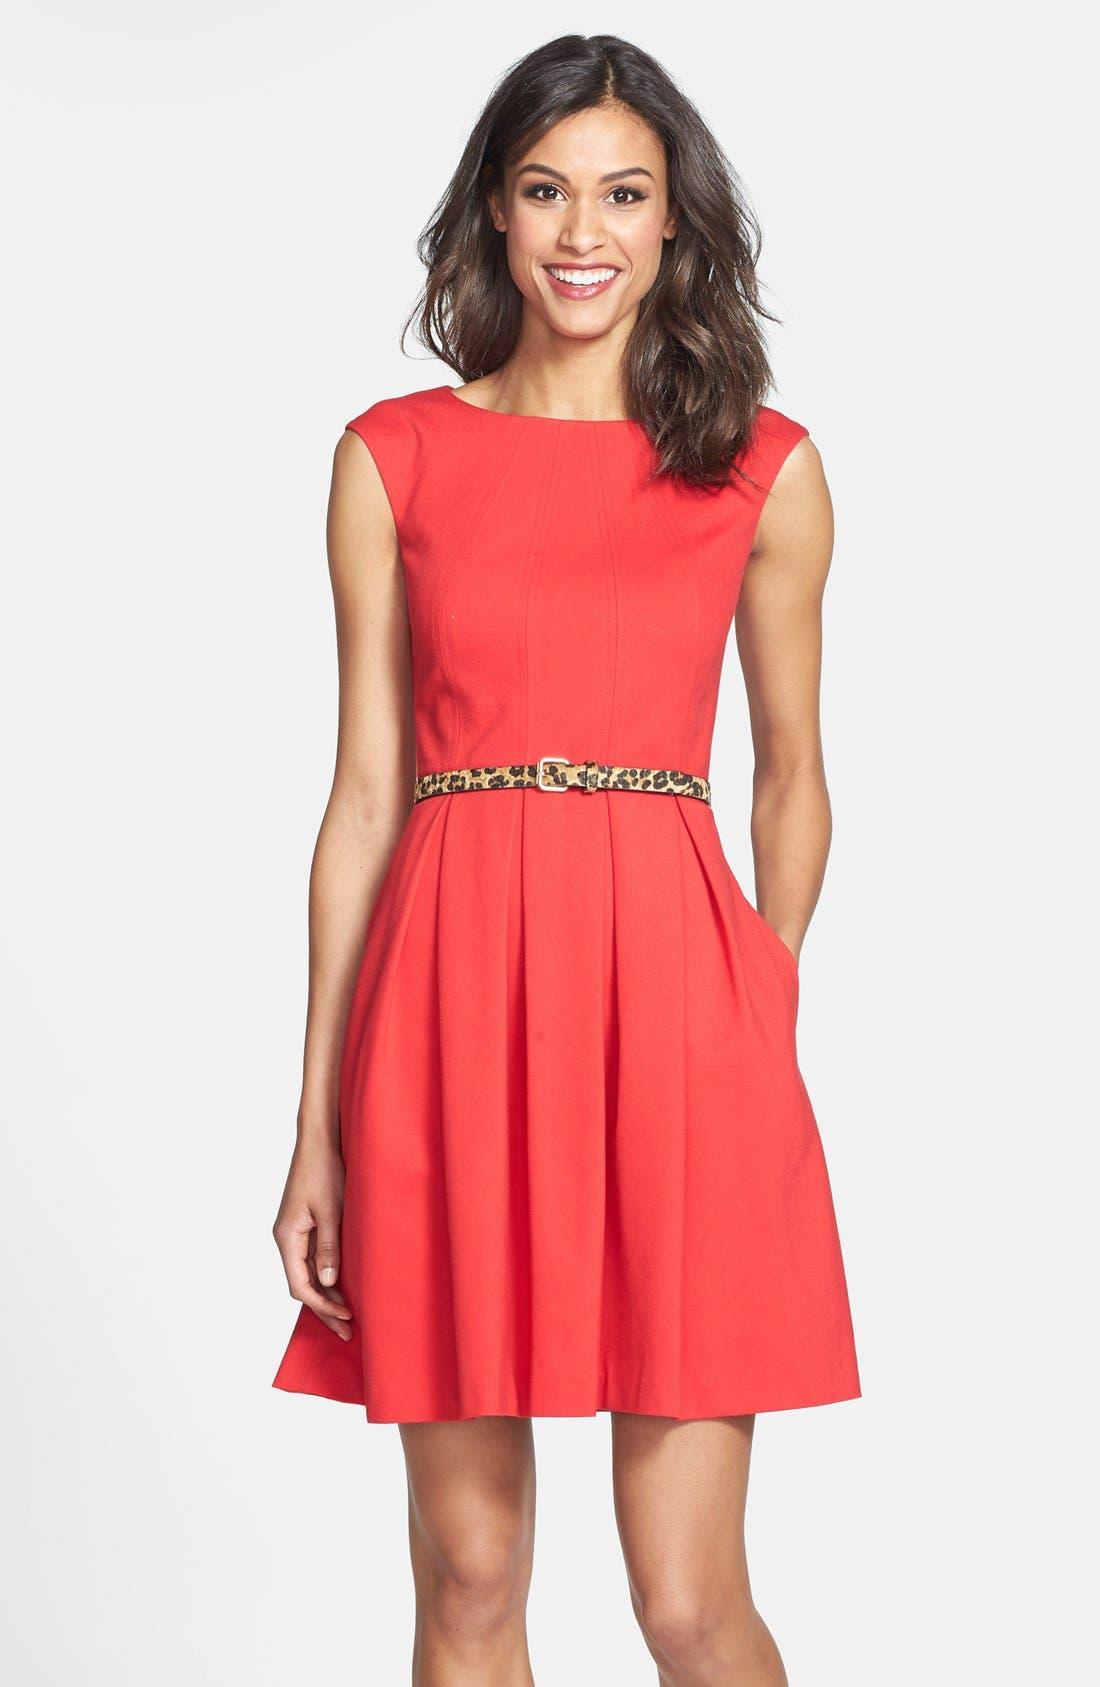 Alternate Image 1 Selected - Eliza J Cutout Back Belted Ponte Knit Fit & Flare Dress